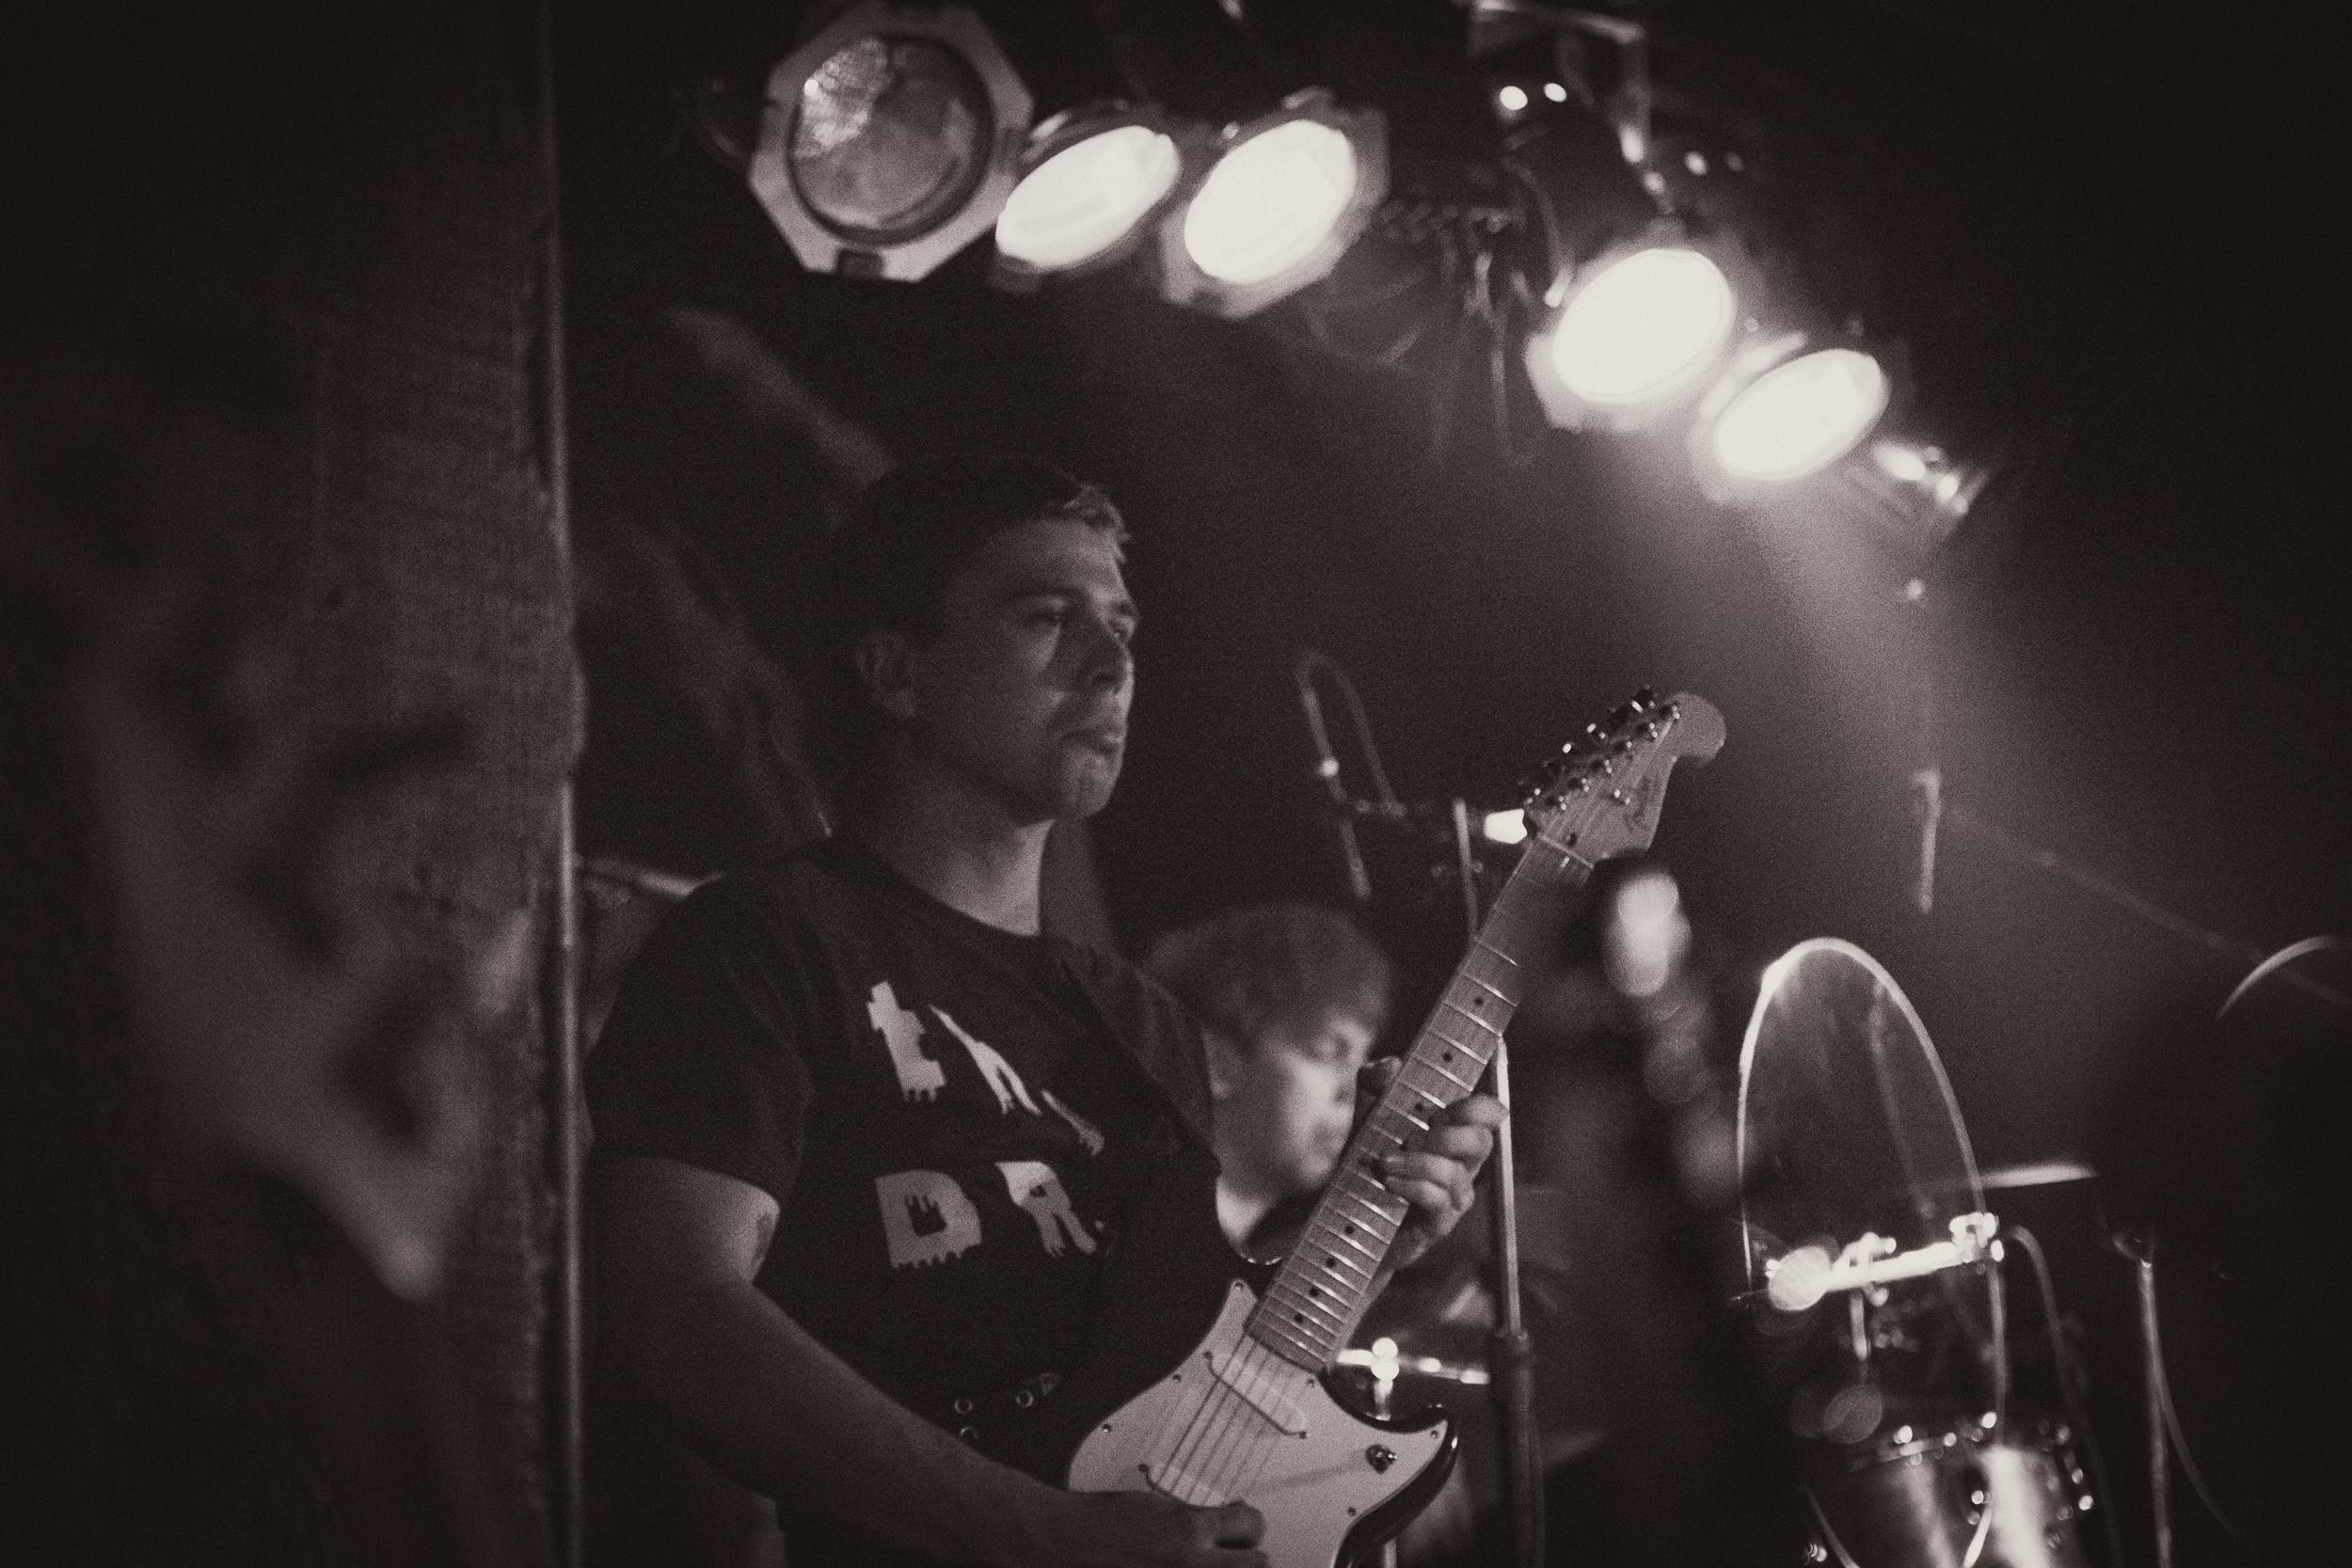 The Drums at Black Cat (Photo by Carolina Correa-Caro; @veronik_bandw)